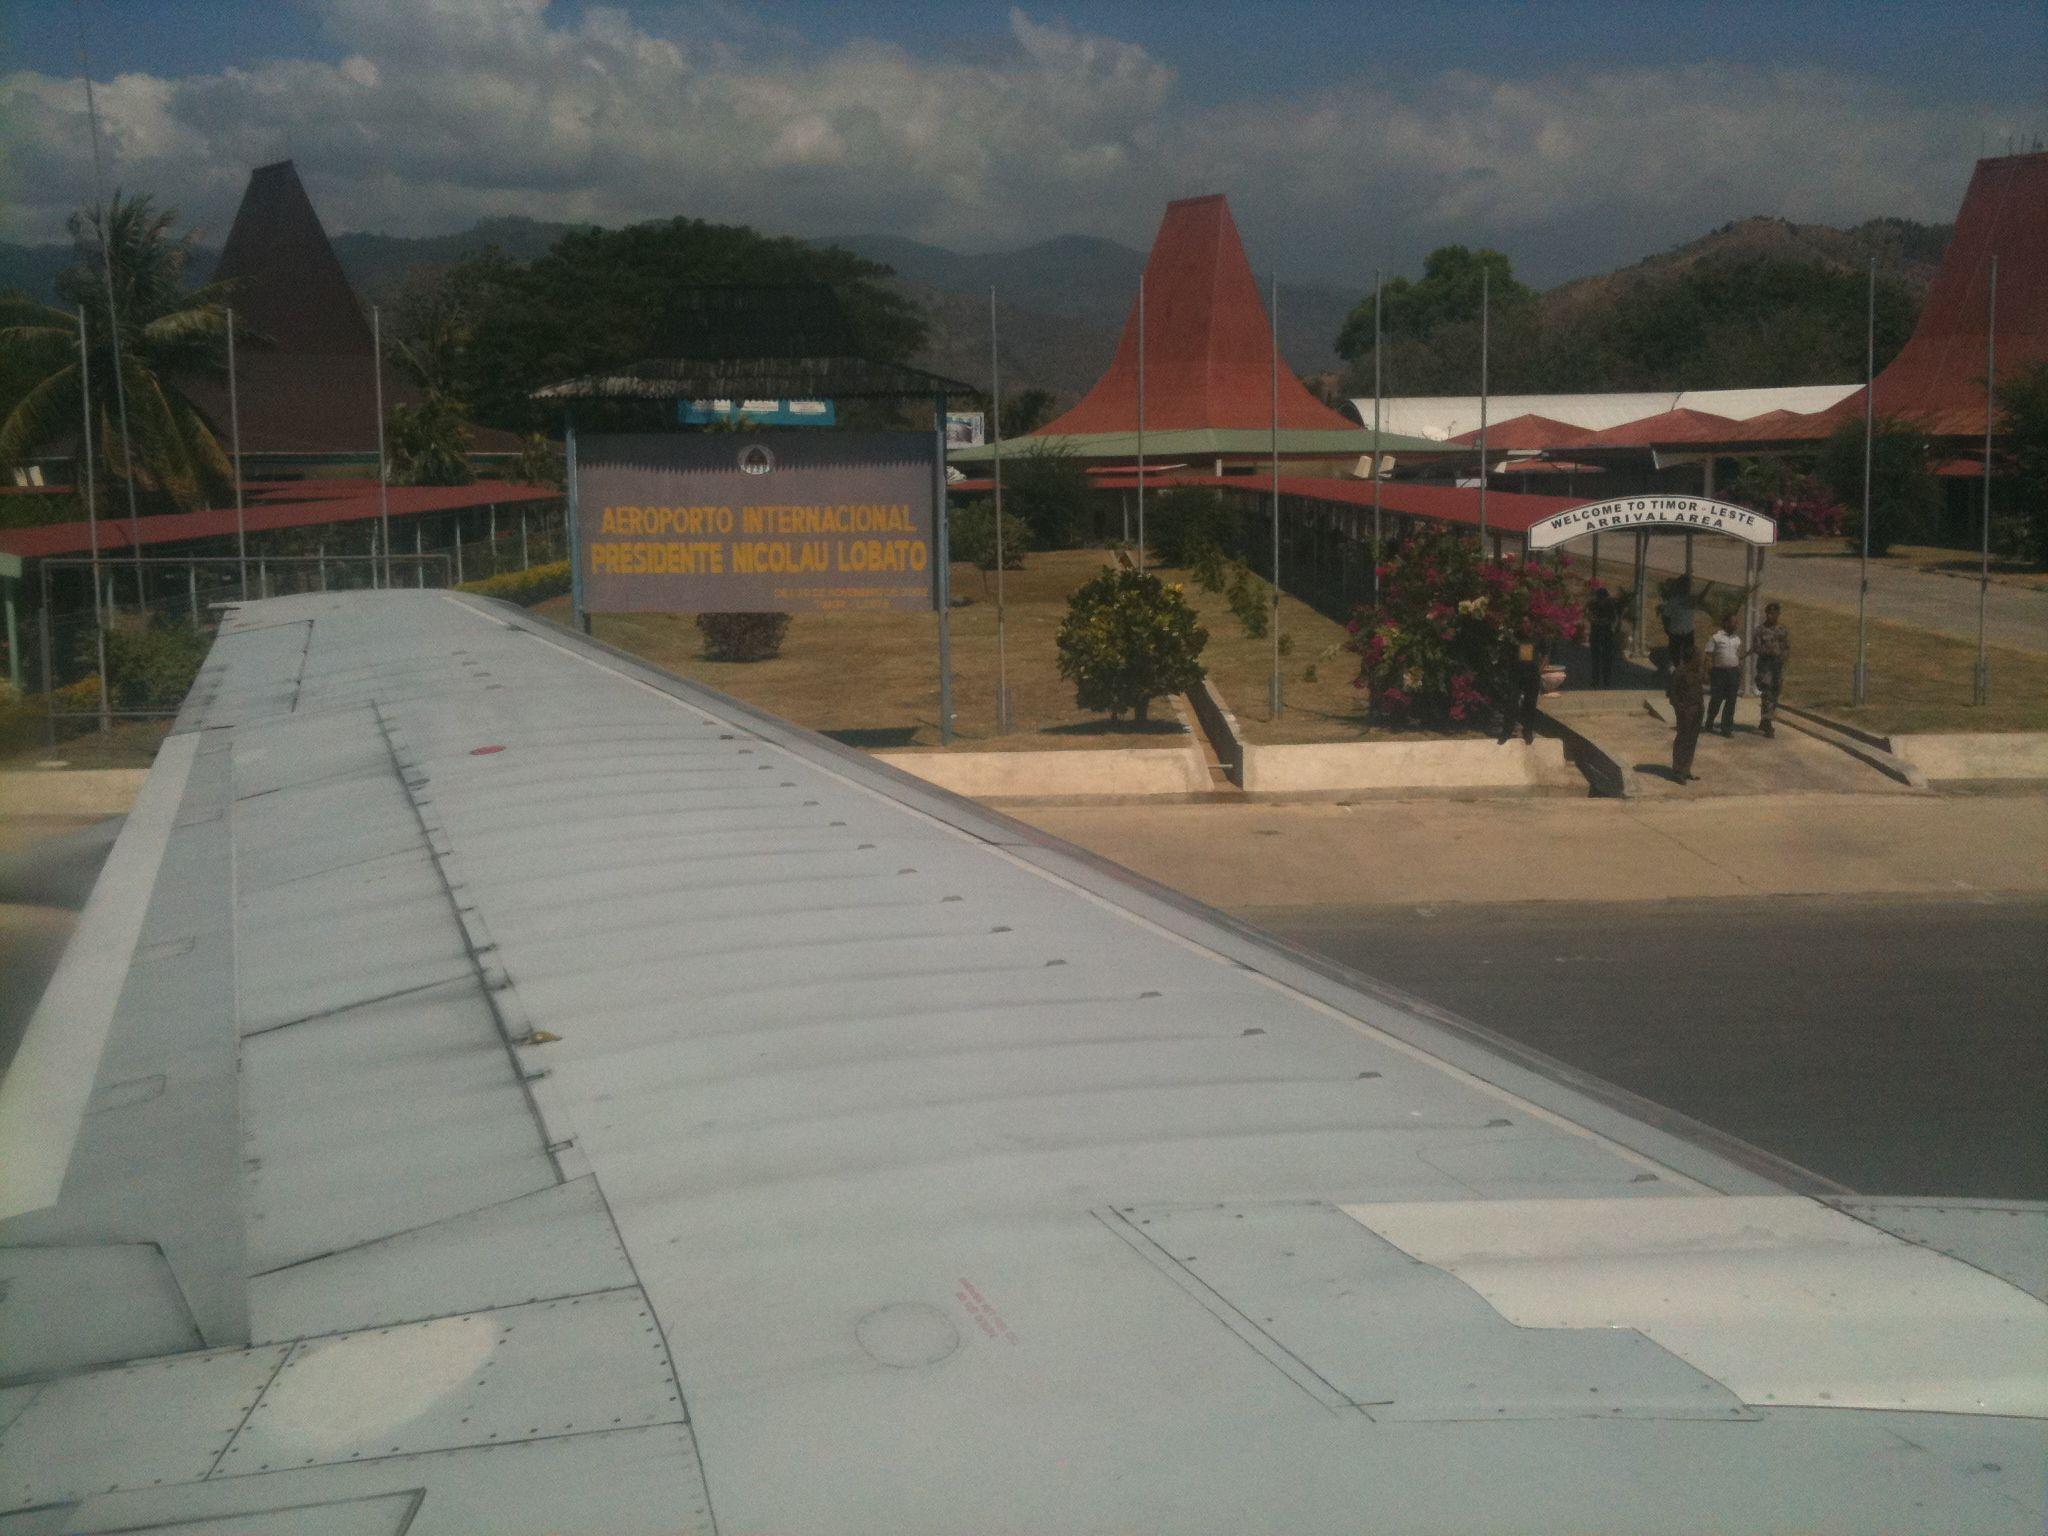 Aeroporto Dili : Timor lorosae east timor dili airport travel voyages pinterest